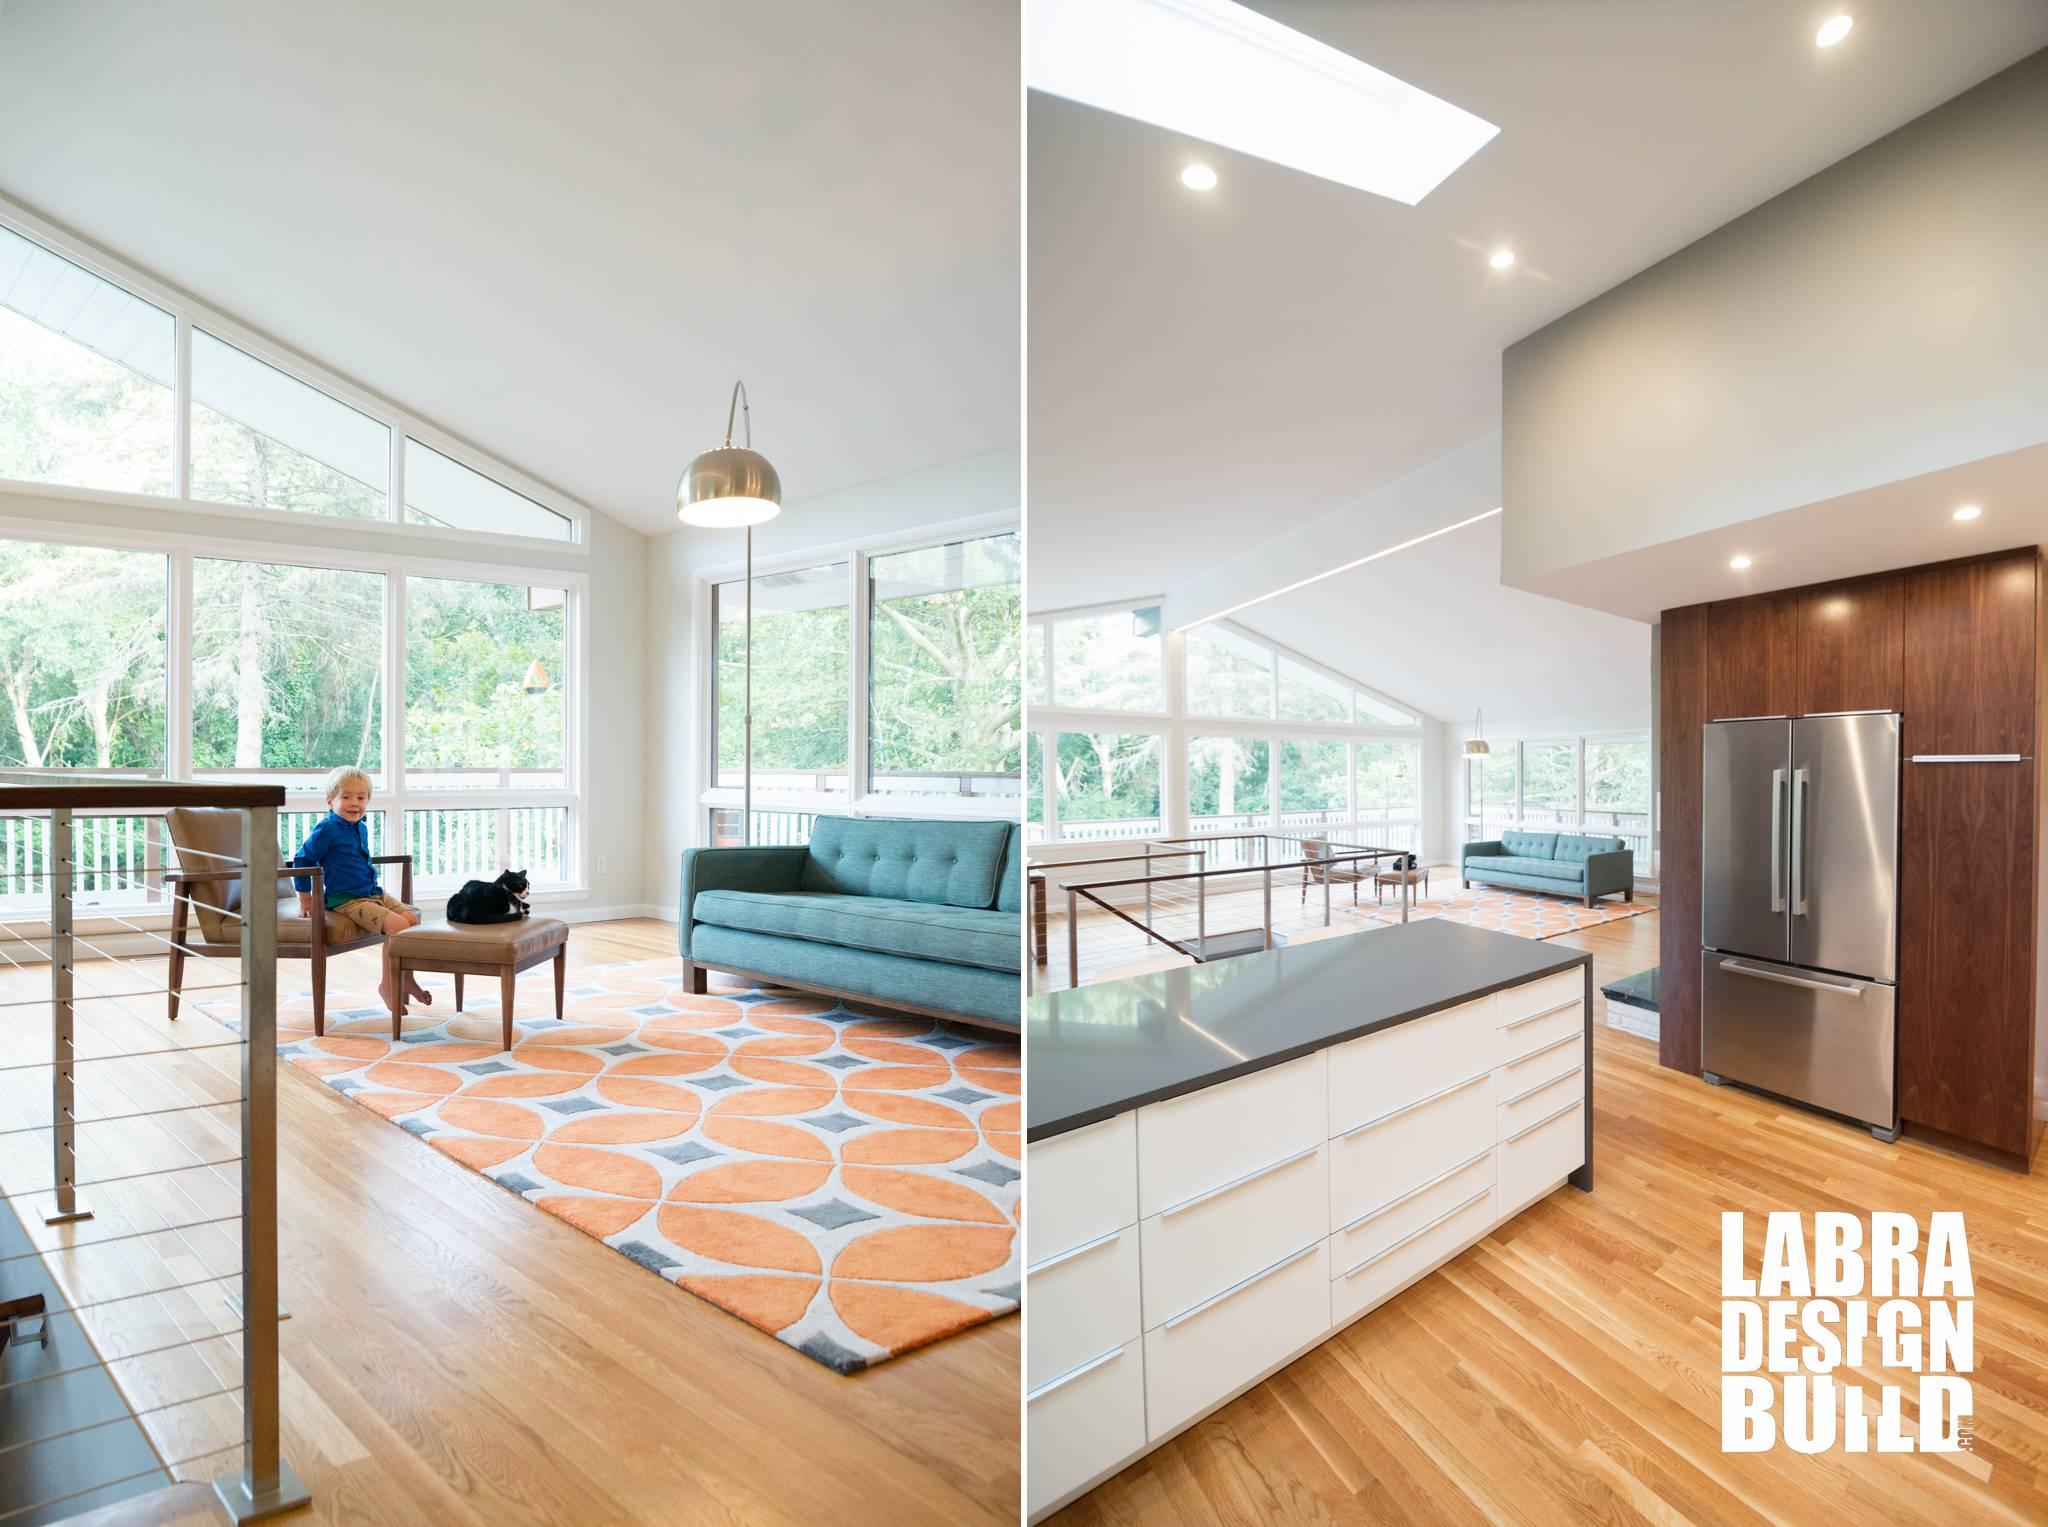 Mid century modern kitchen backsplash tile. Labra Design+Build | mid century modern kitchen remodel ...